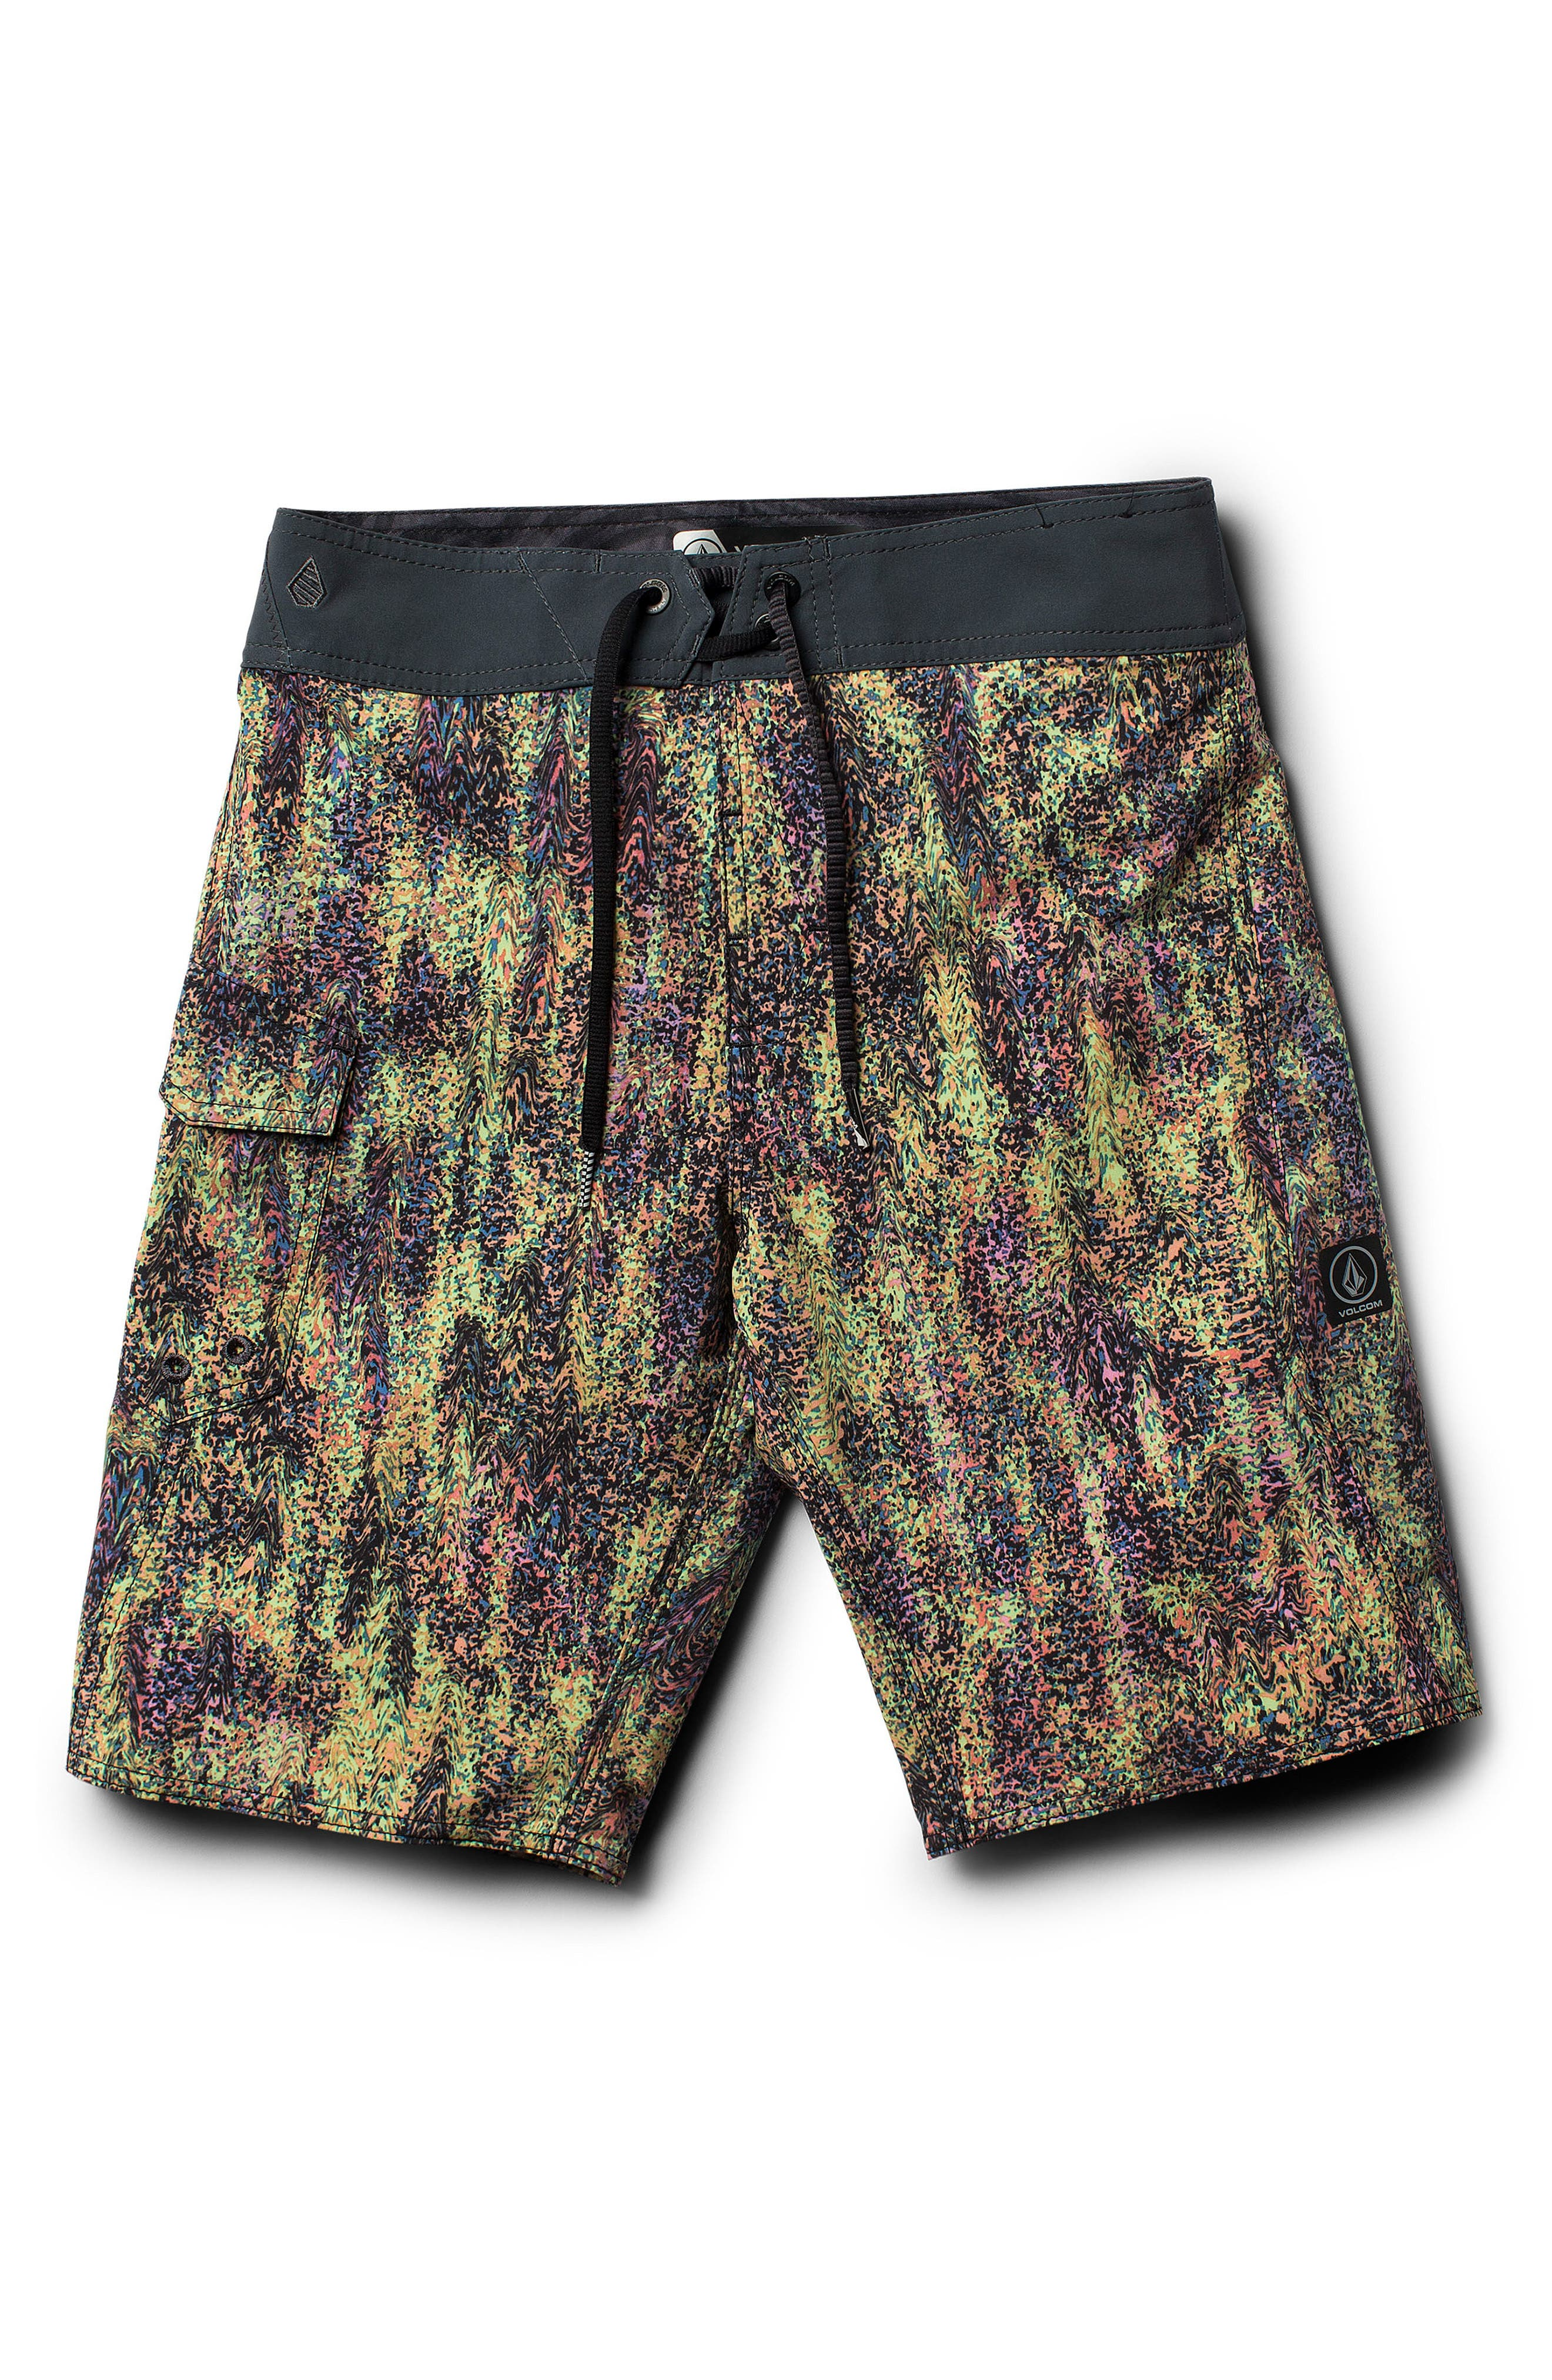 VOLCOM Plasm Mod Board Shorts, Main, color, 020